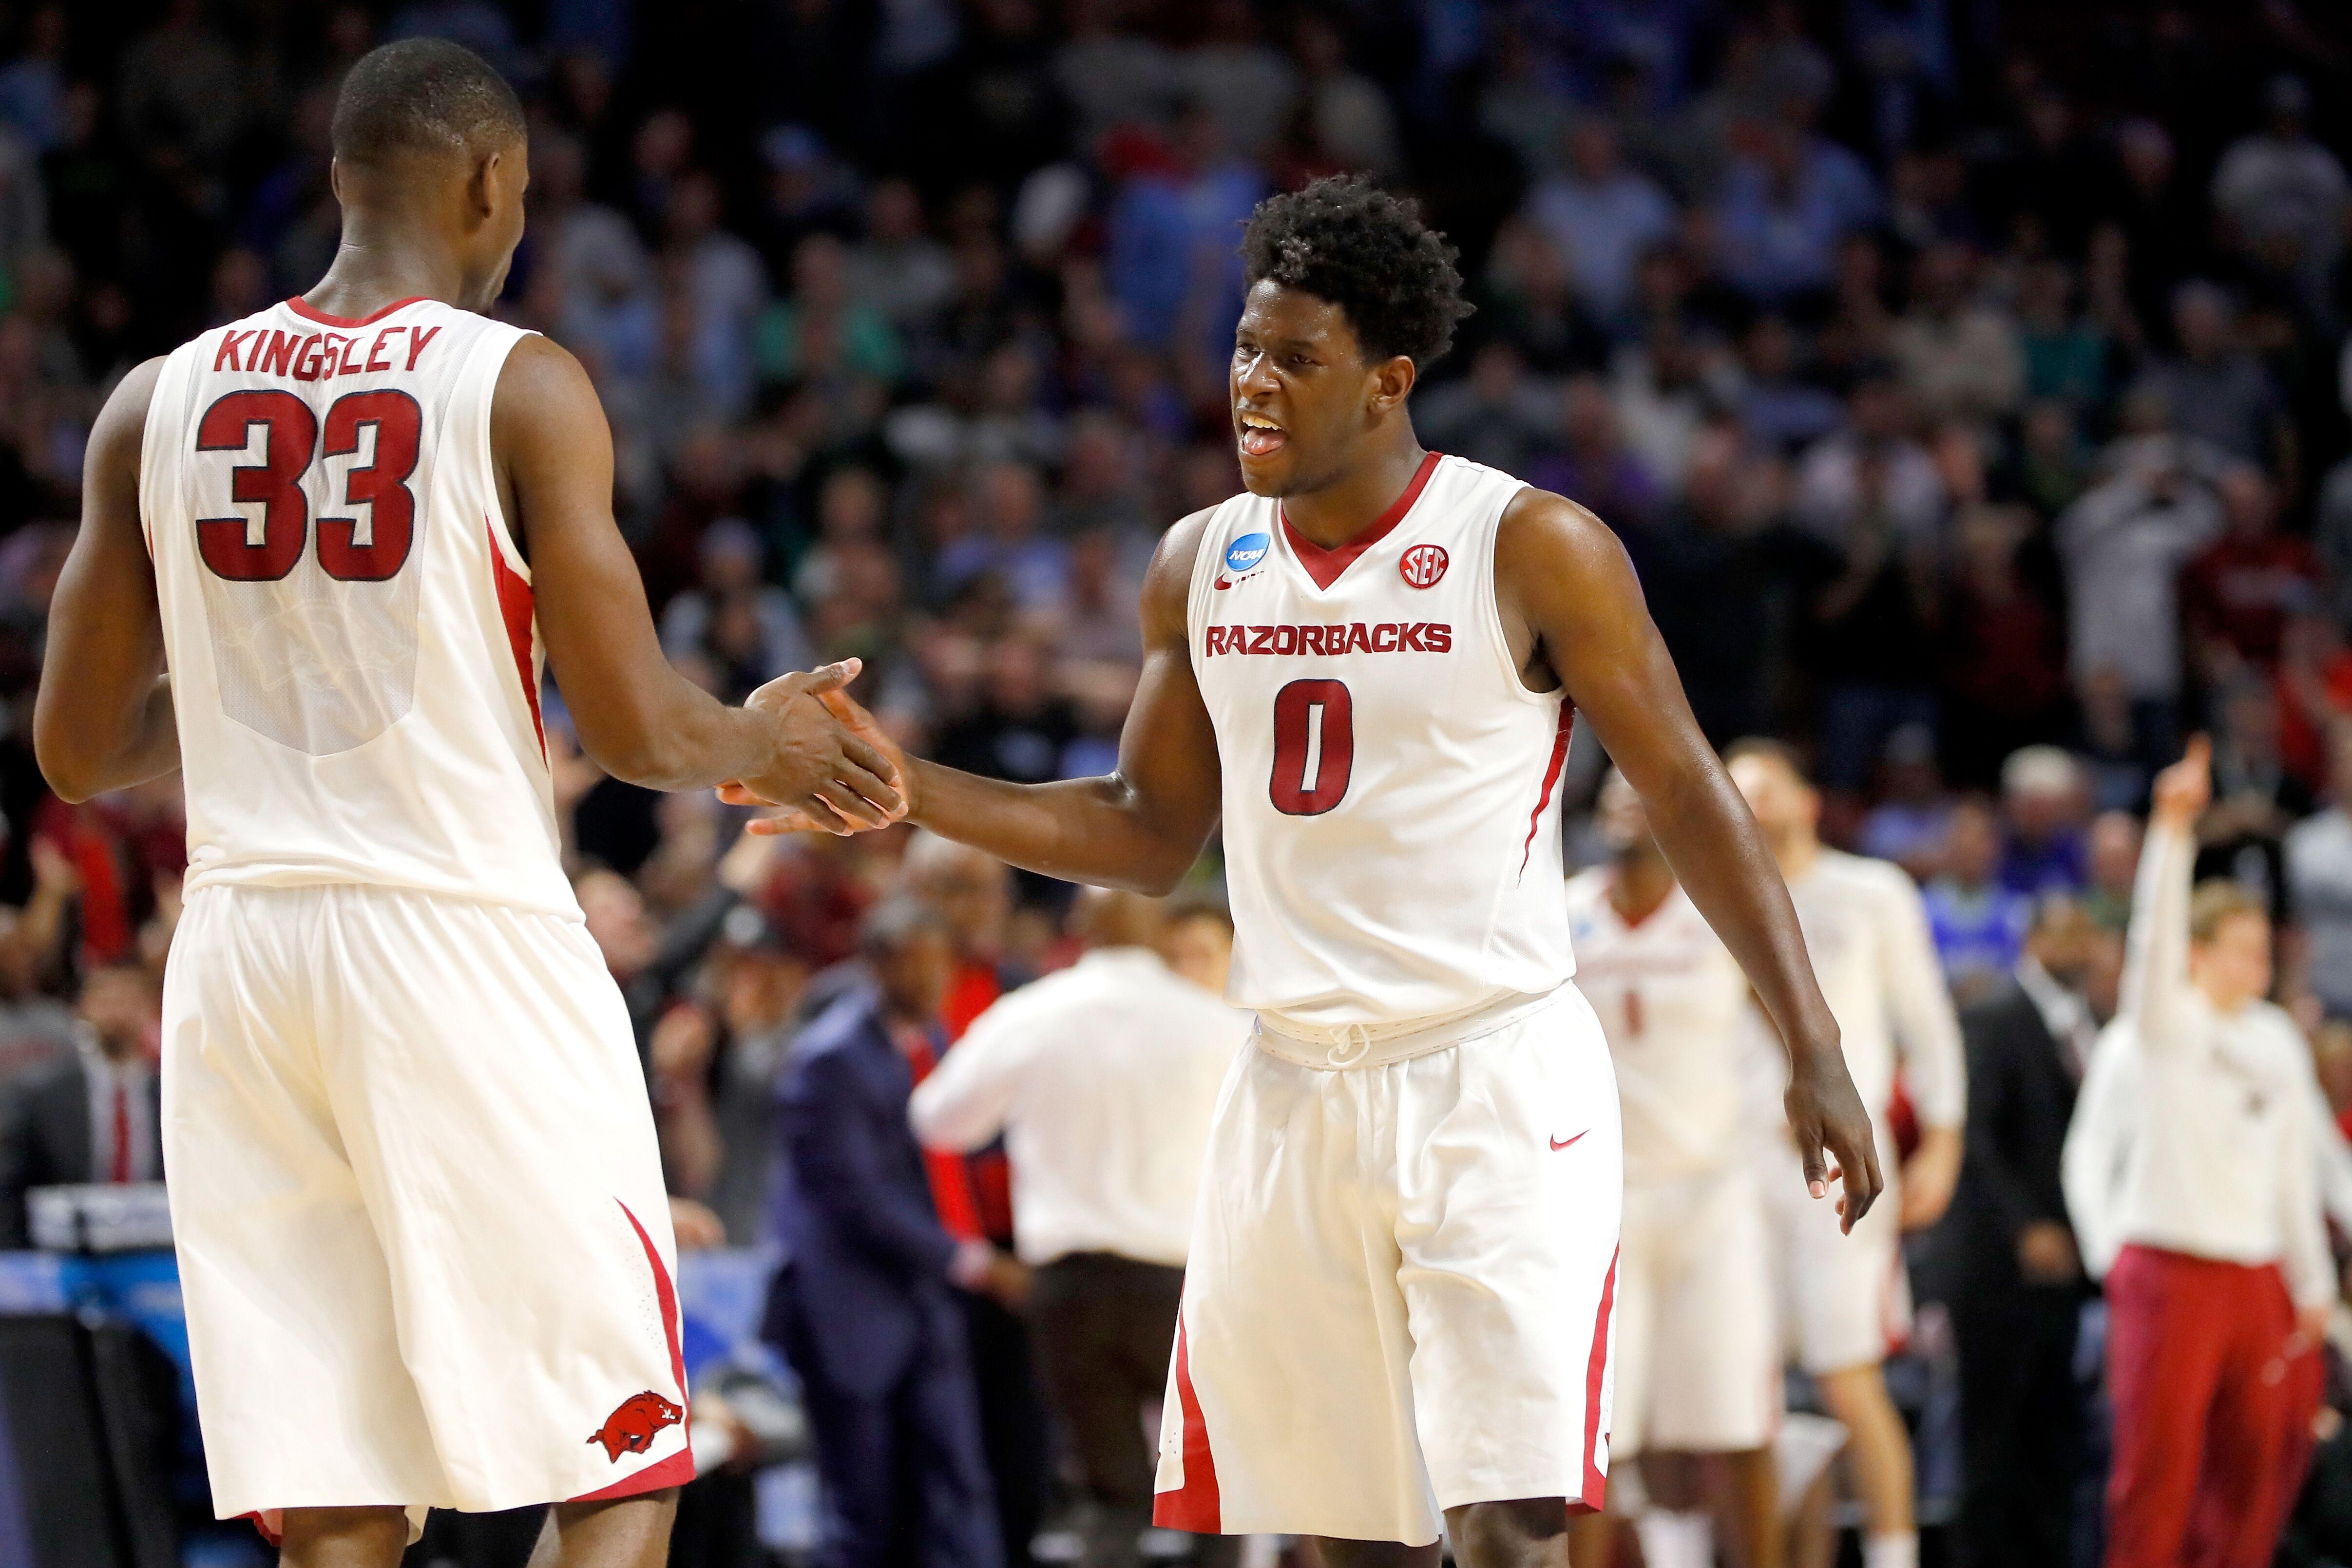 arkansas basketball: can daniel gafford lead the young razorbacks